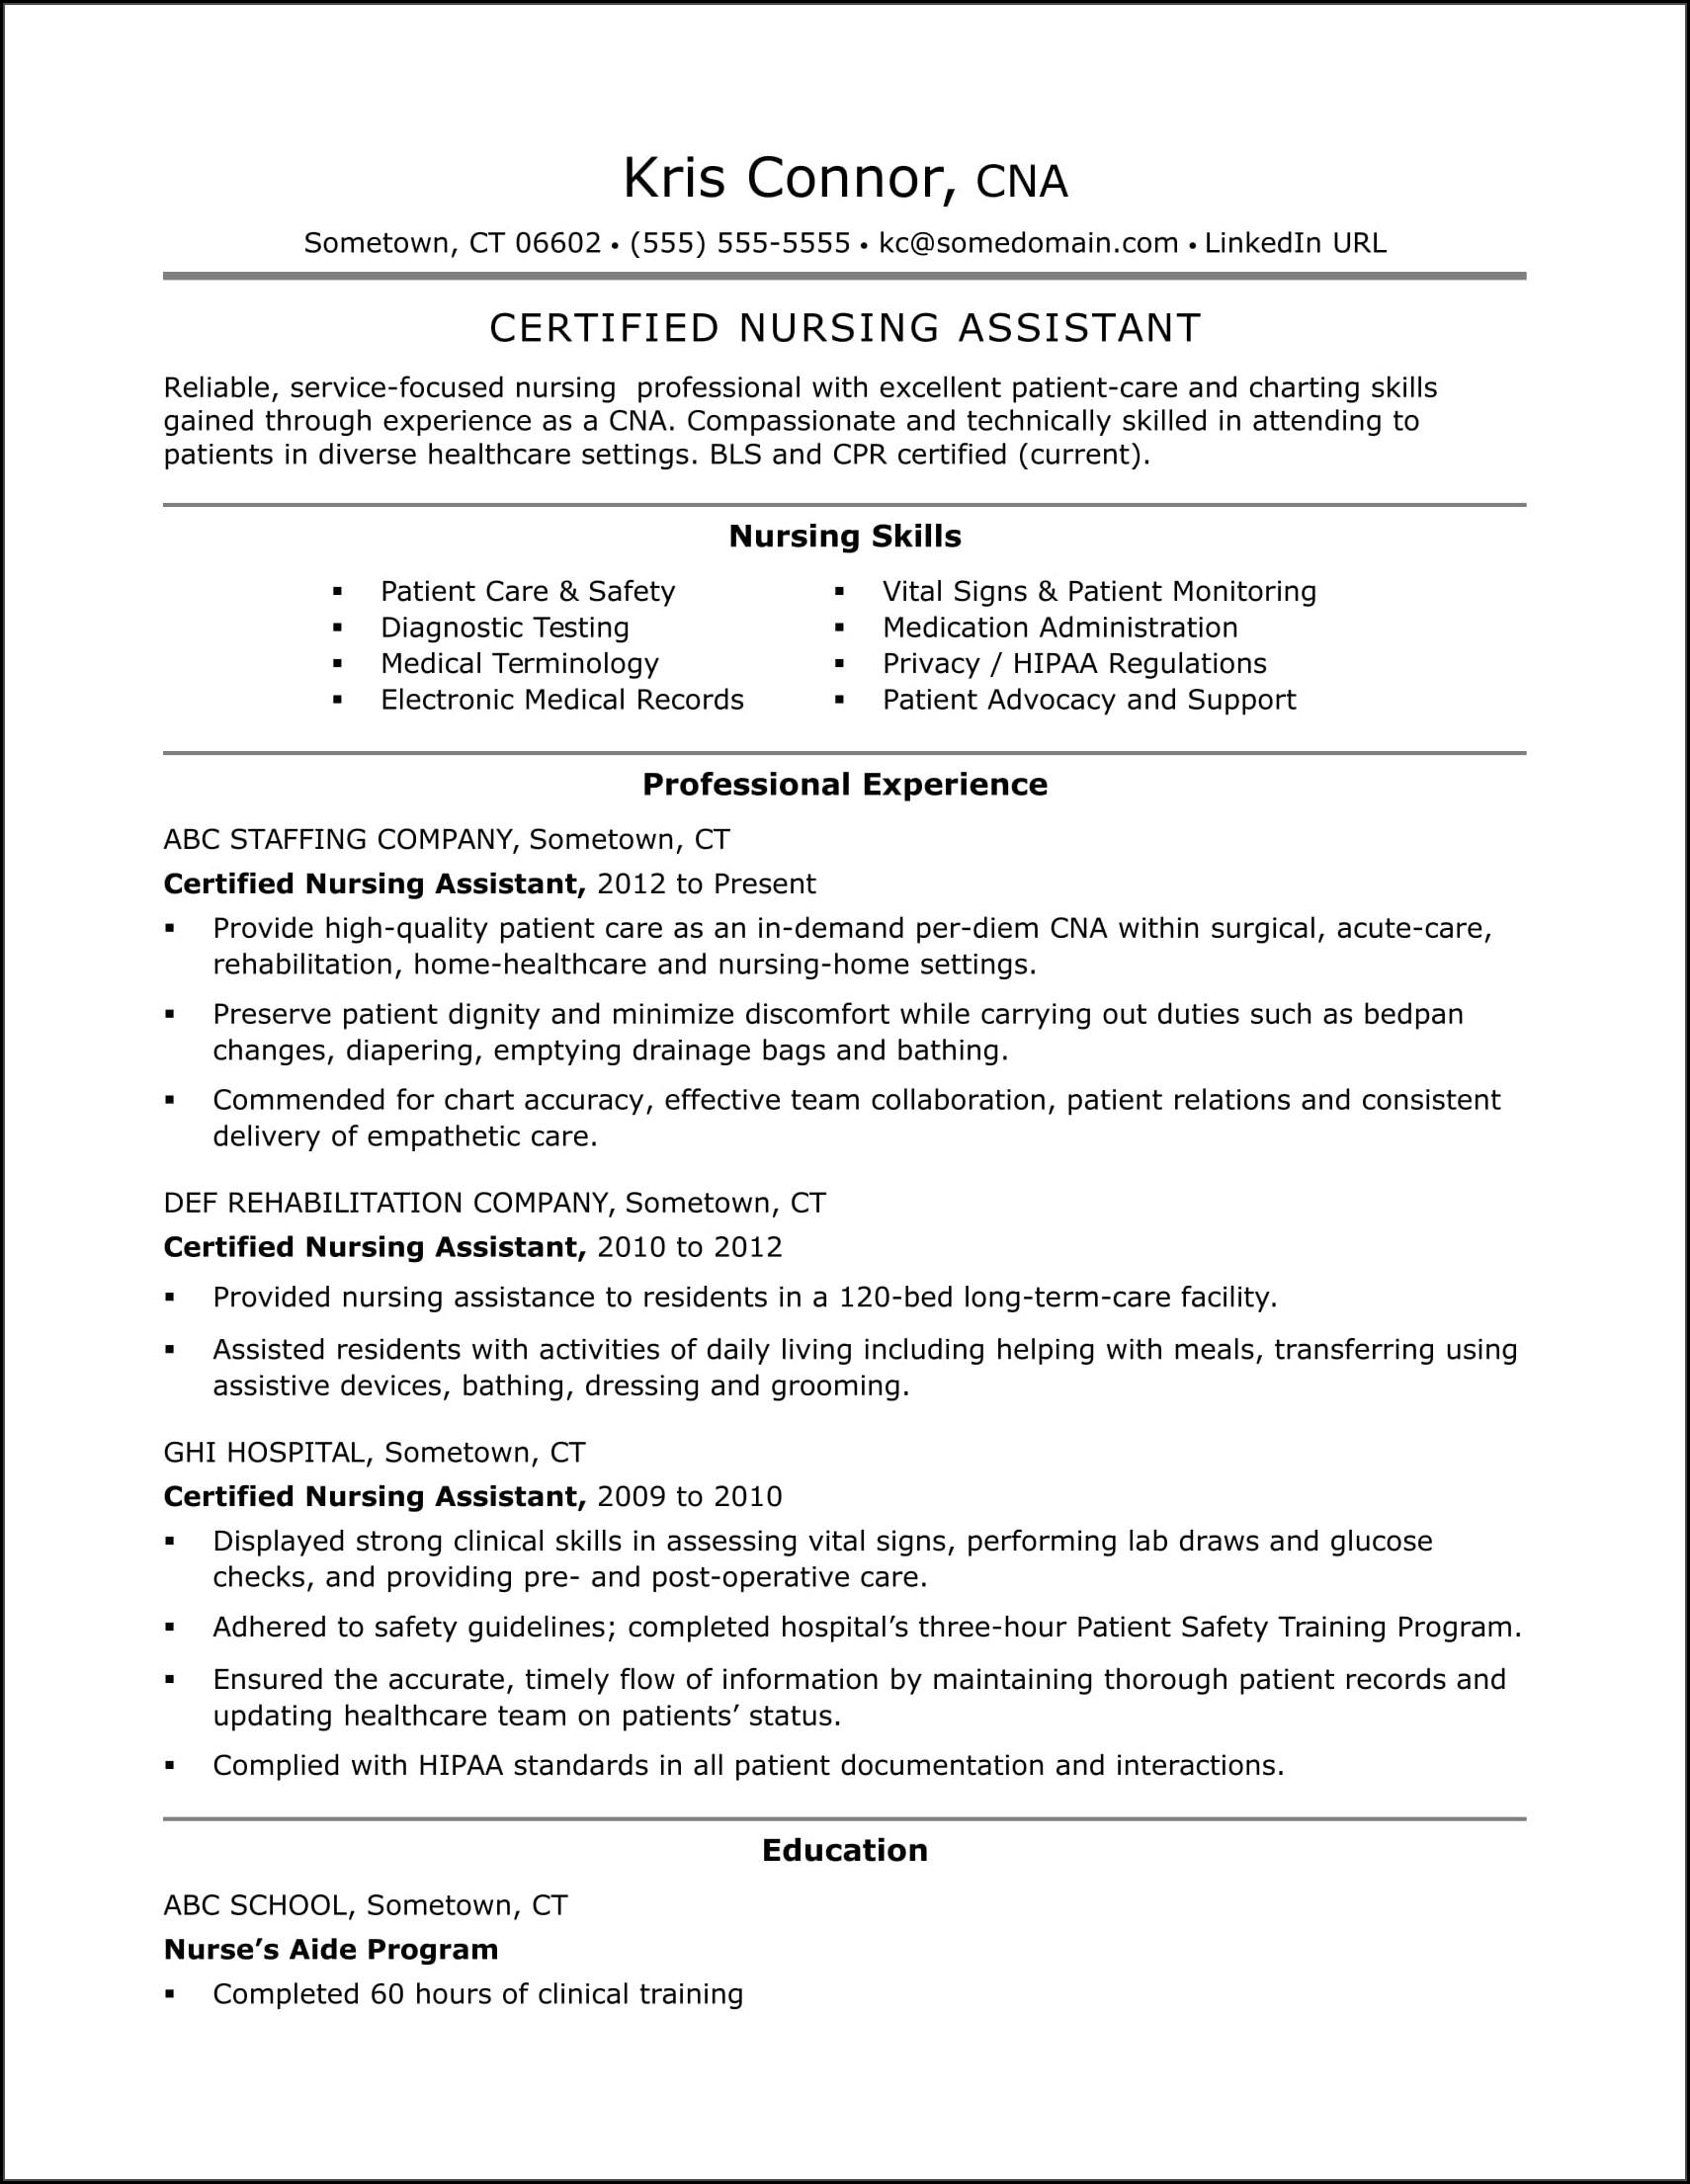 Relevant Skills For Nursing Assistant Resume